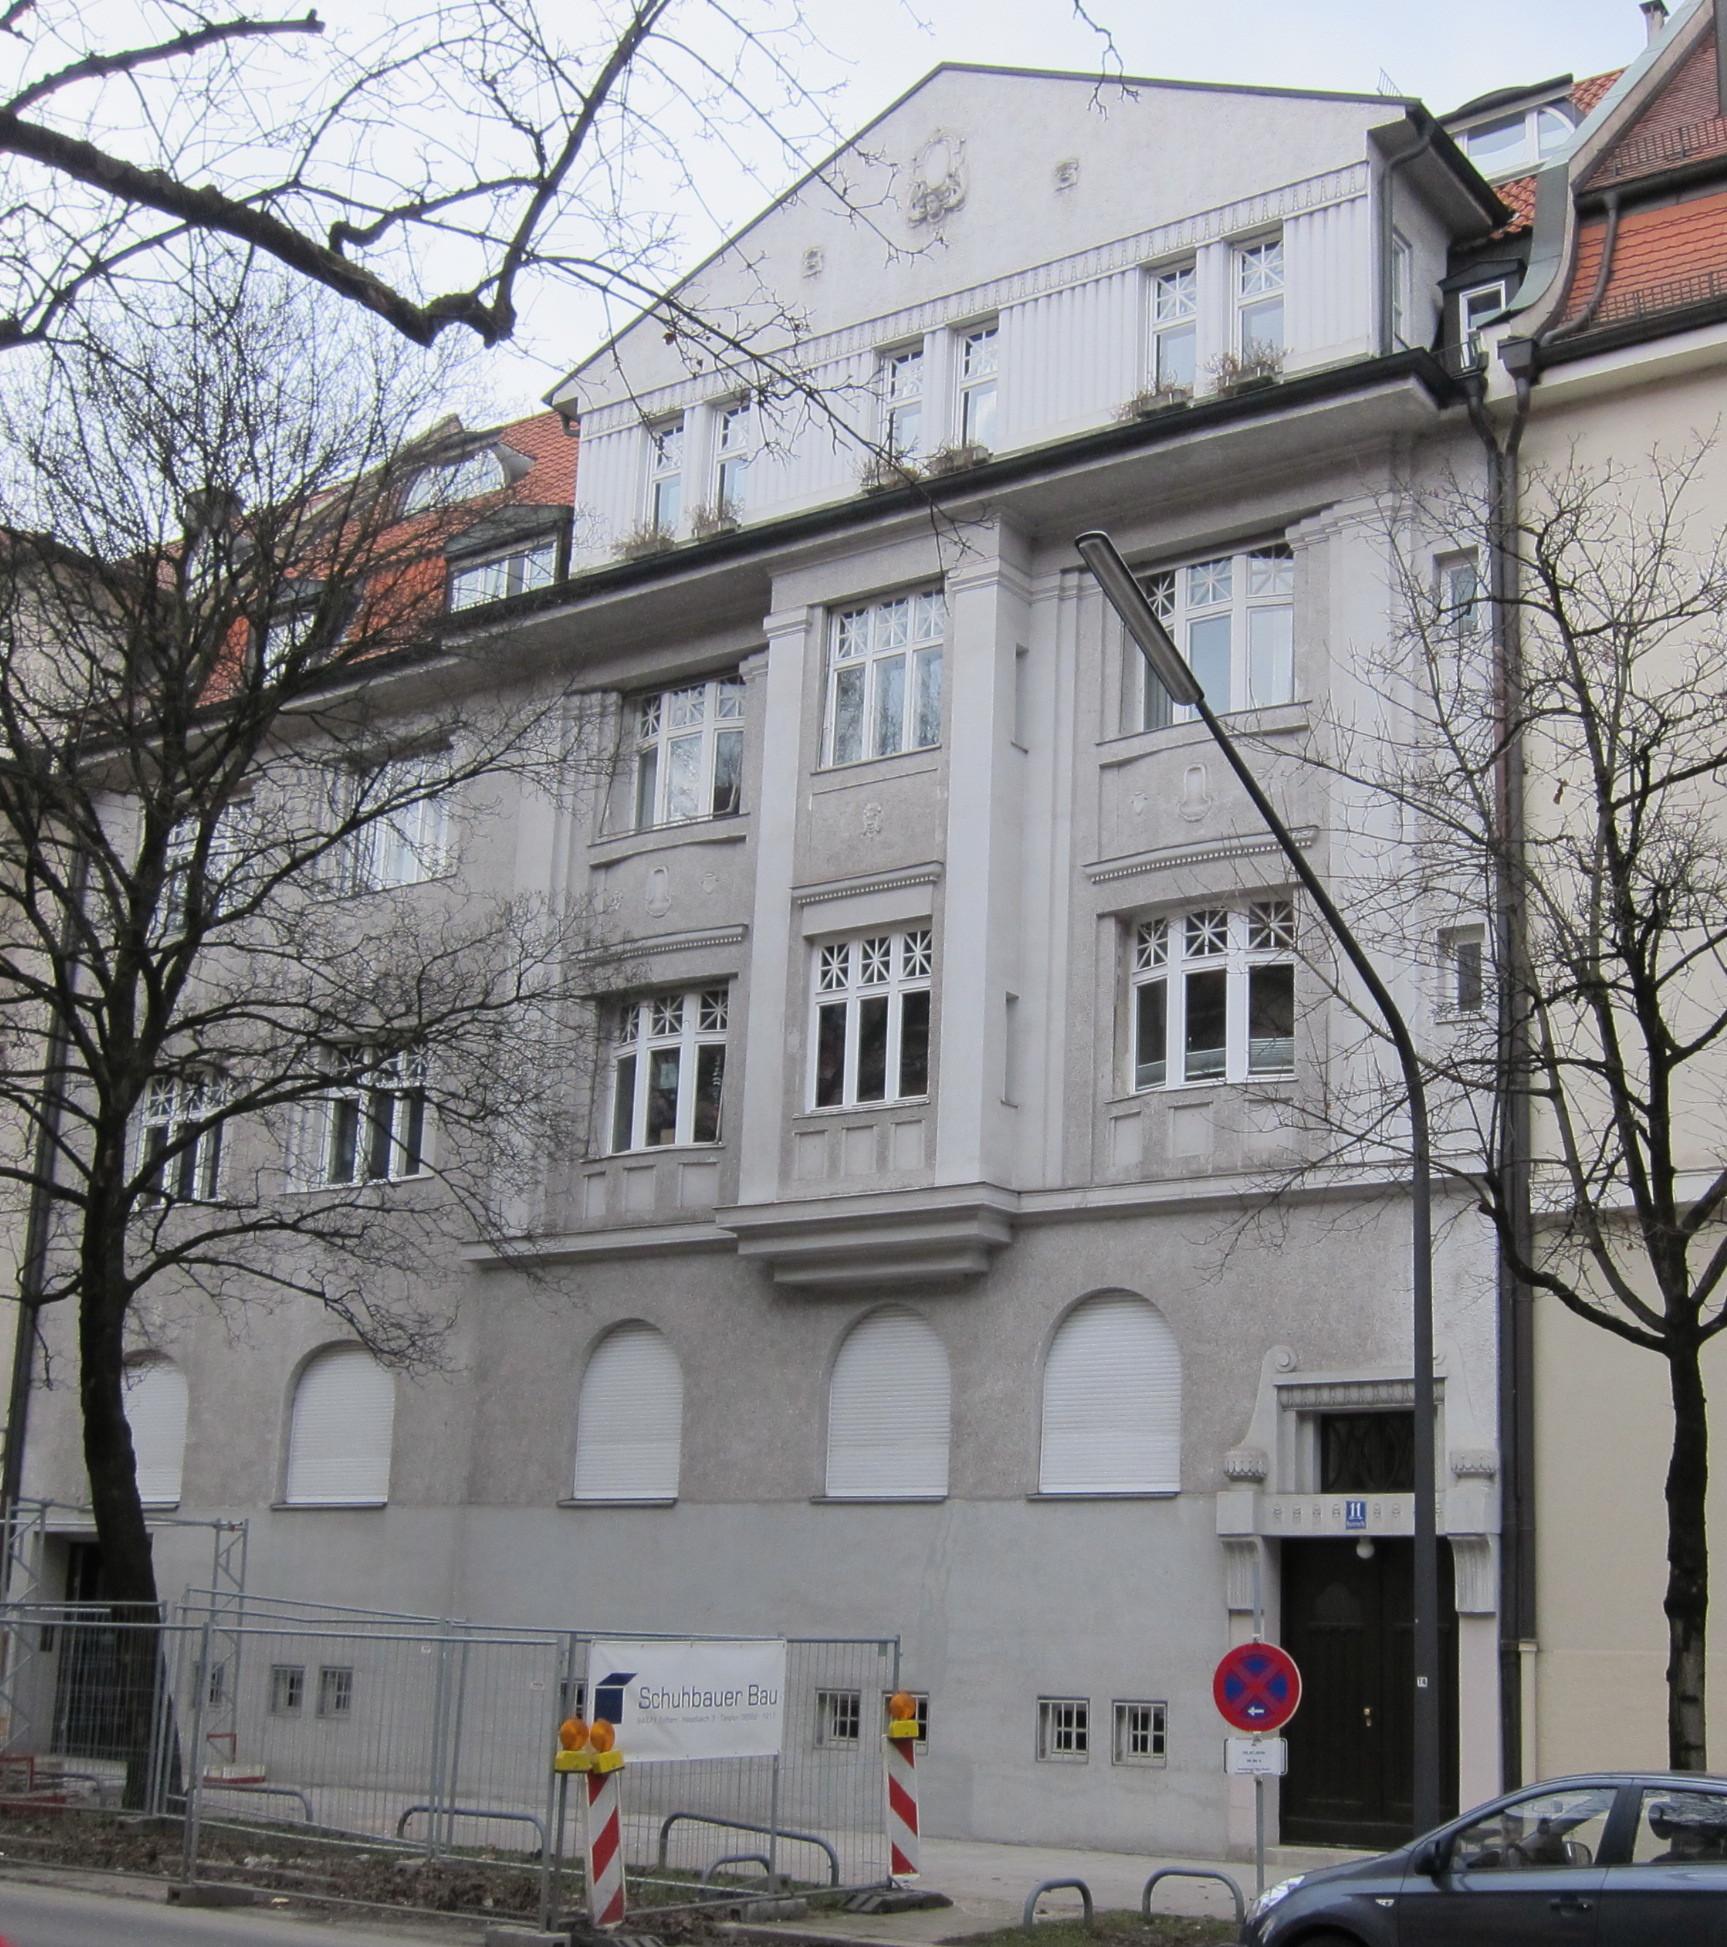 Mauerkircherstr München file mauerkircherstr 11 muenchen 01 jpg wikimedia commons